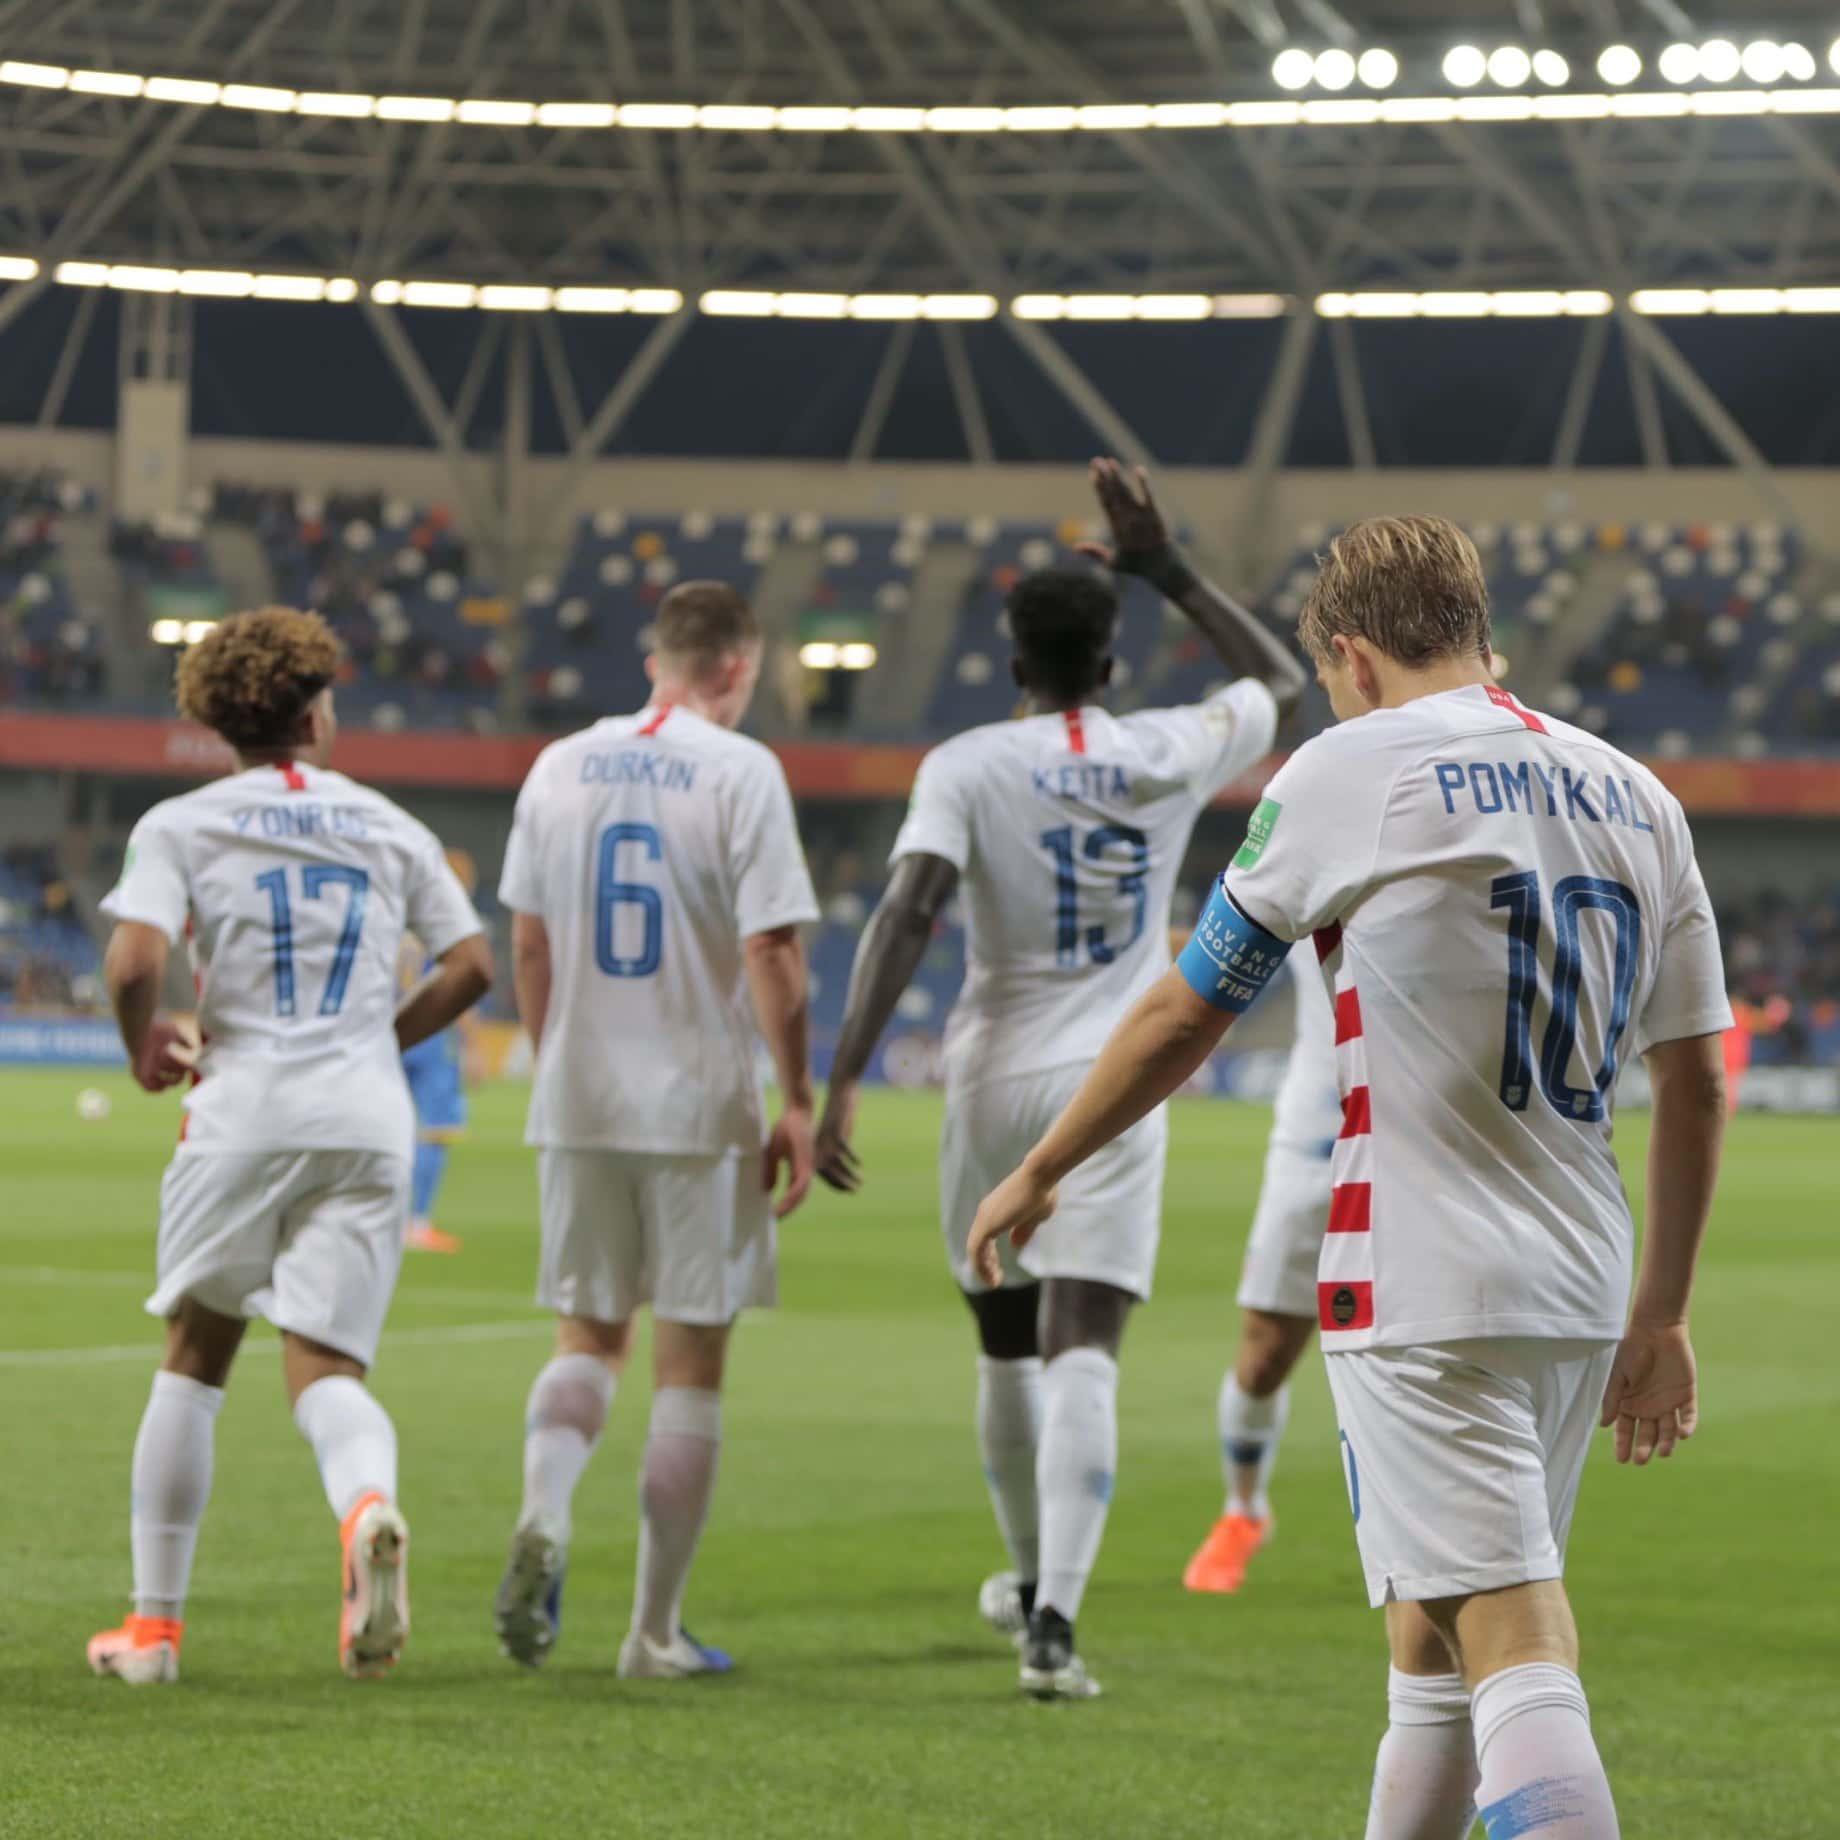 fb6d0f8c7 USA Drops 2019 U-20 World Cup Opener to Ukraine 2-1